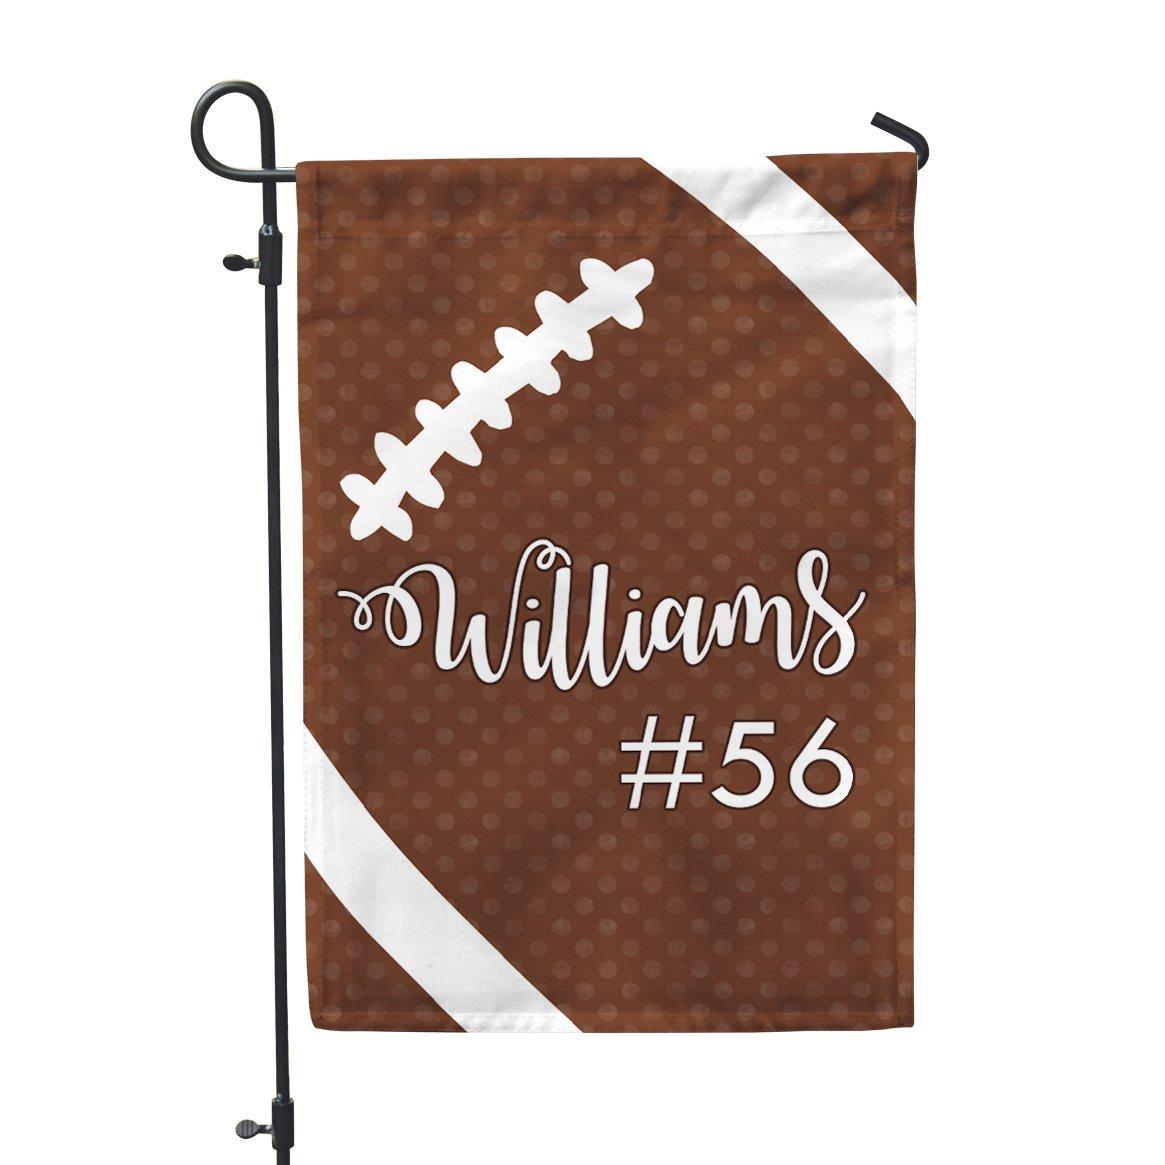 Second East Personalized Custom Tis The Season Football Garden Flag Outdoor Patio Seasonal Holiday Fabric 12''X18''